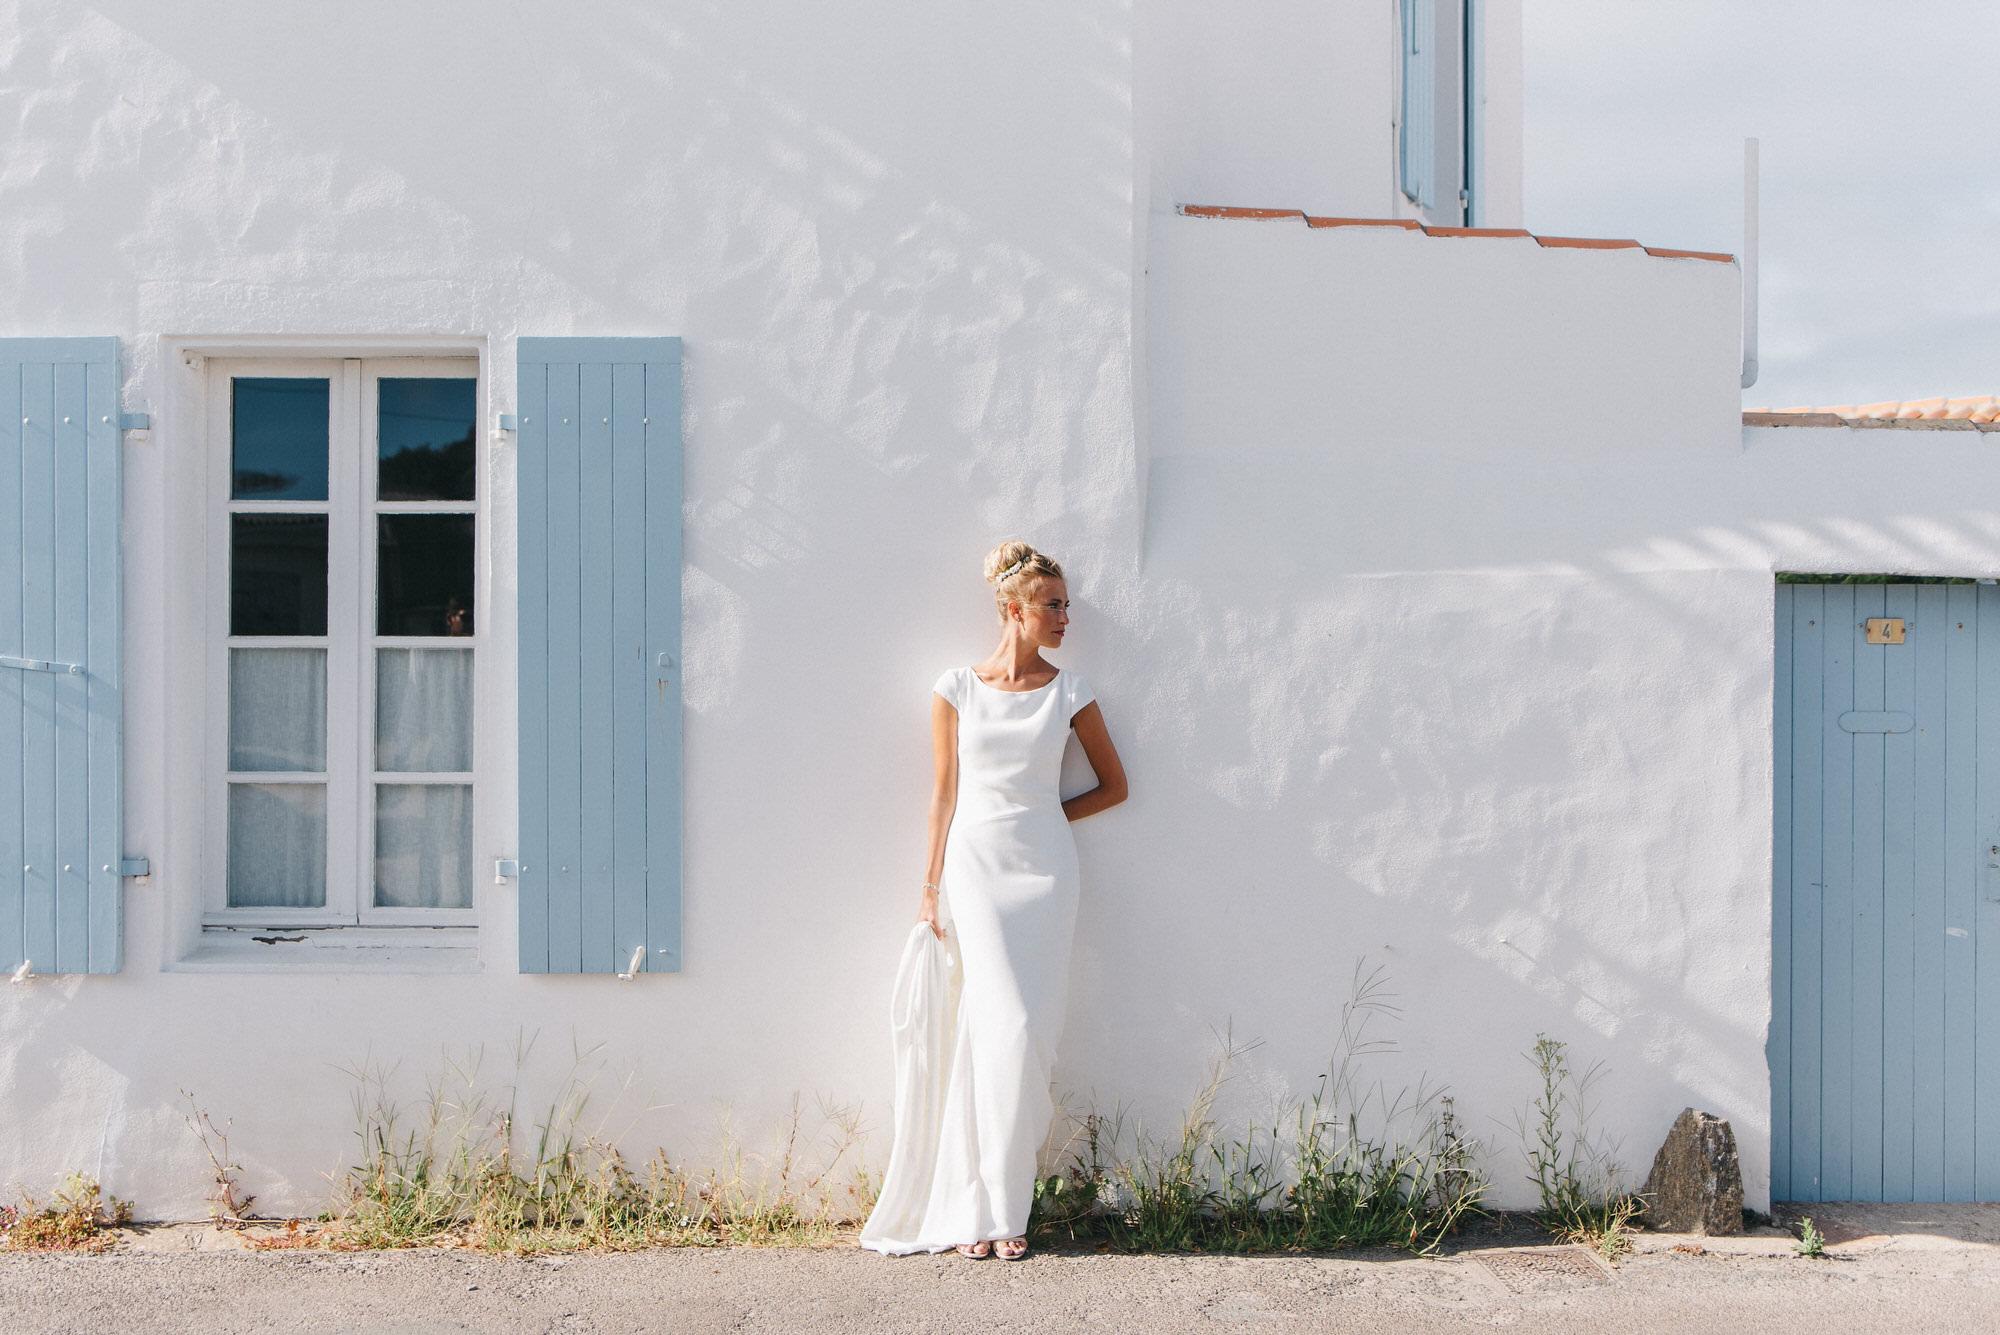 photographe-mariage-ile-d-yeu-00041